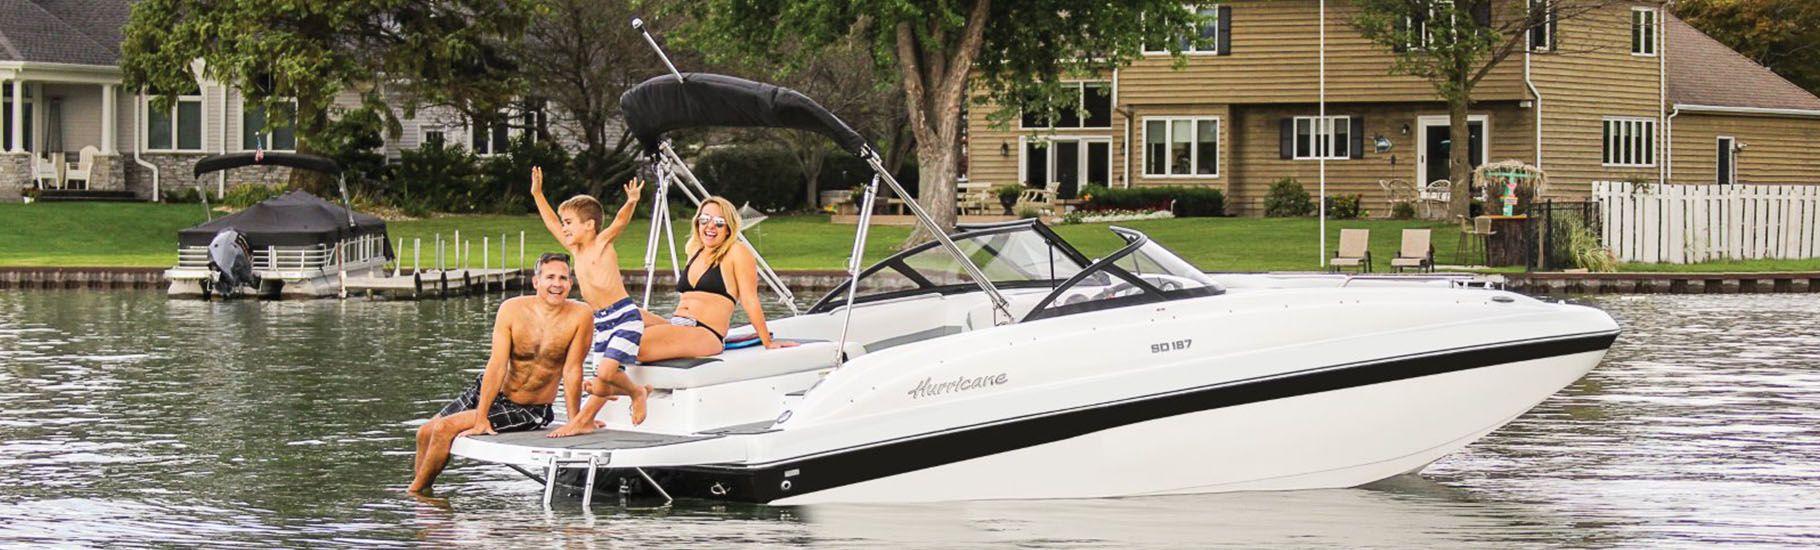 Hurricane SunDeck IO deck boat